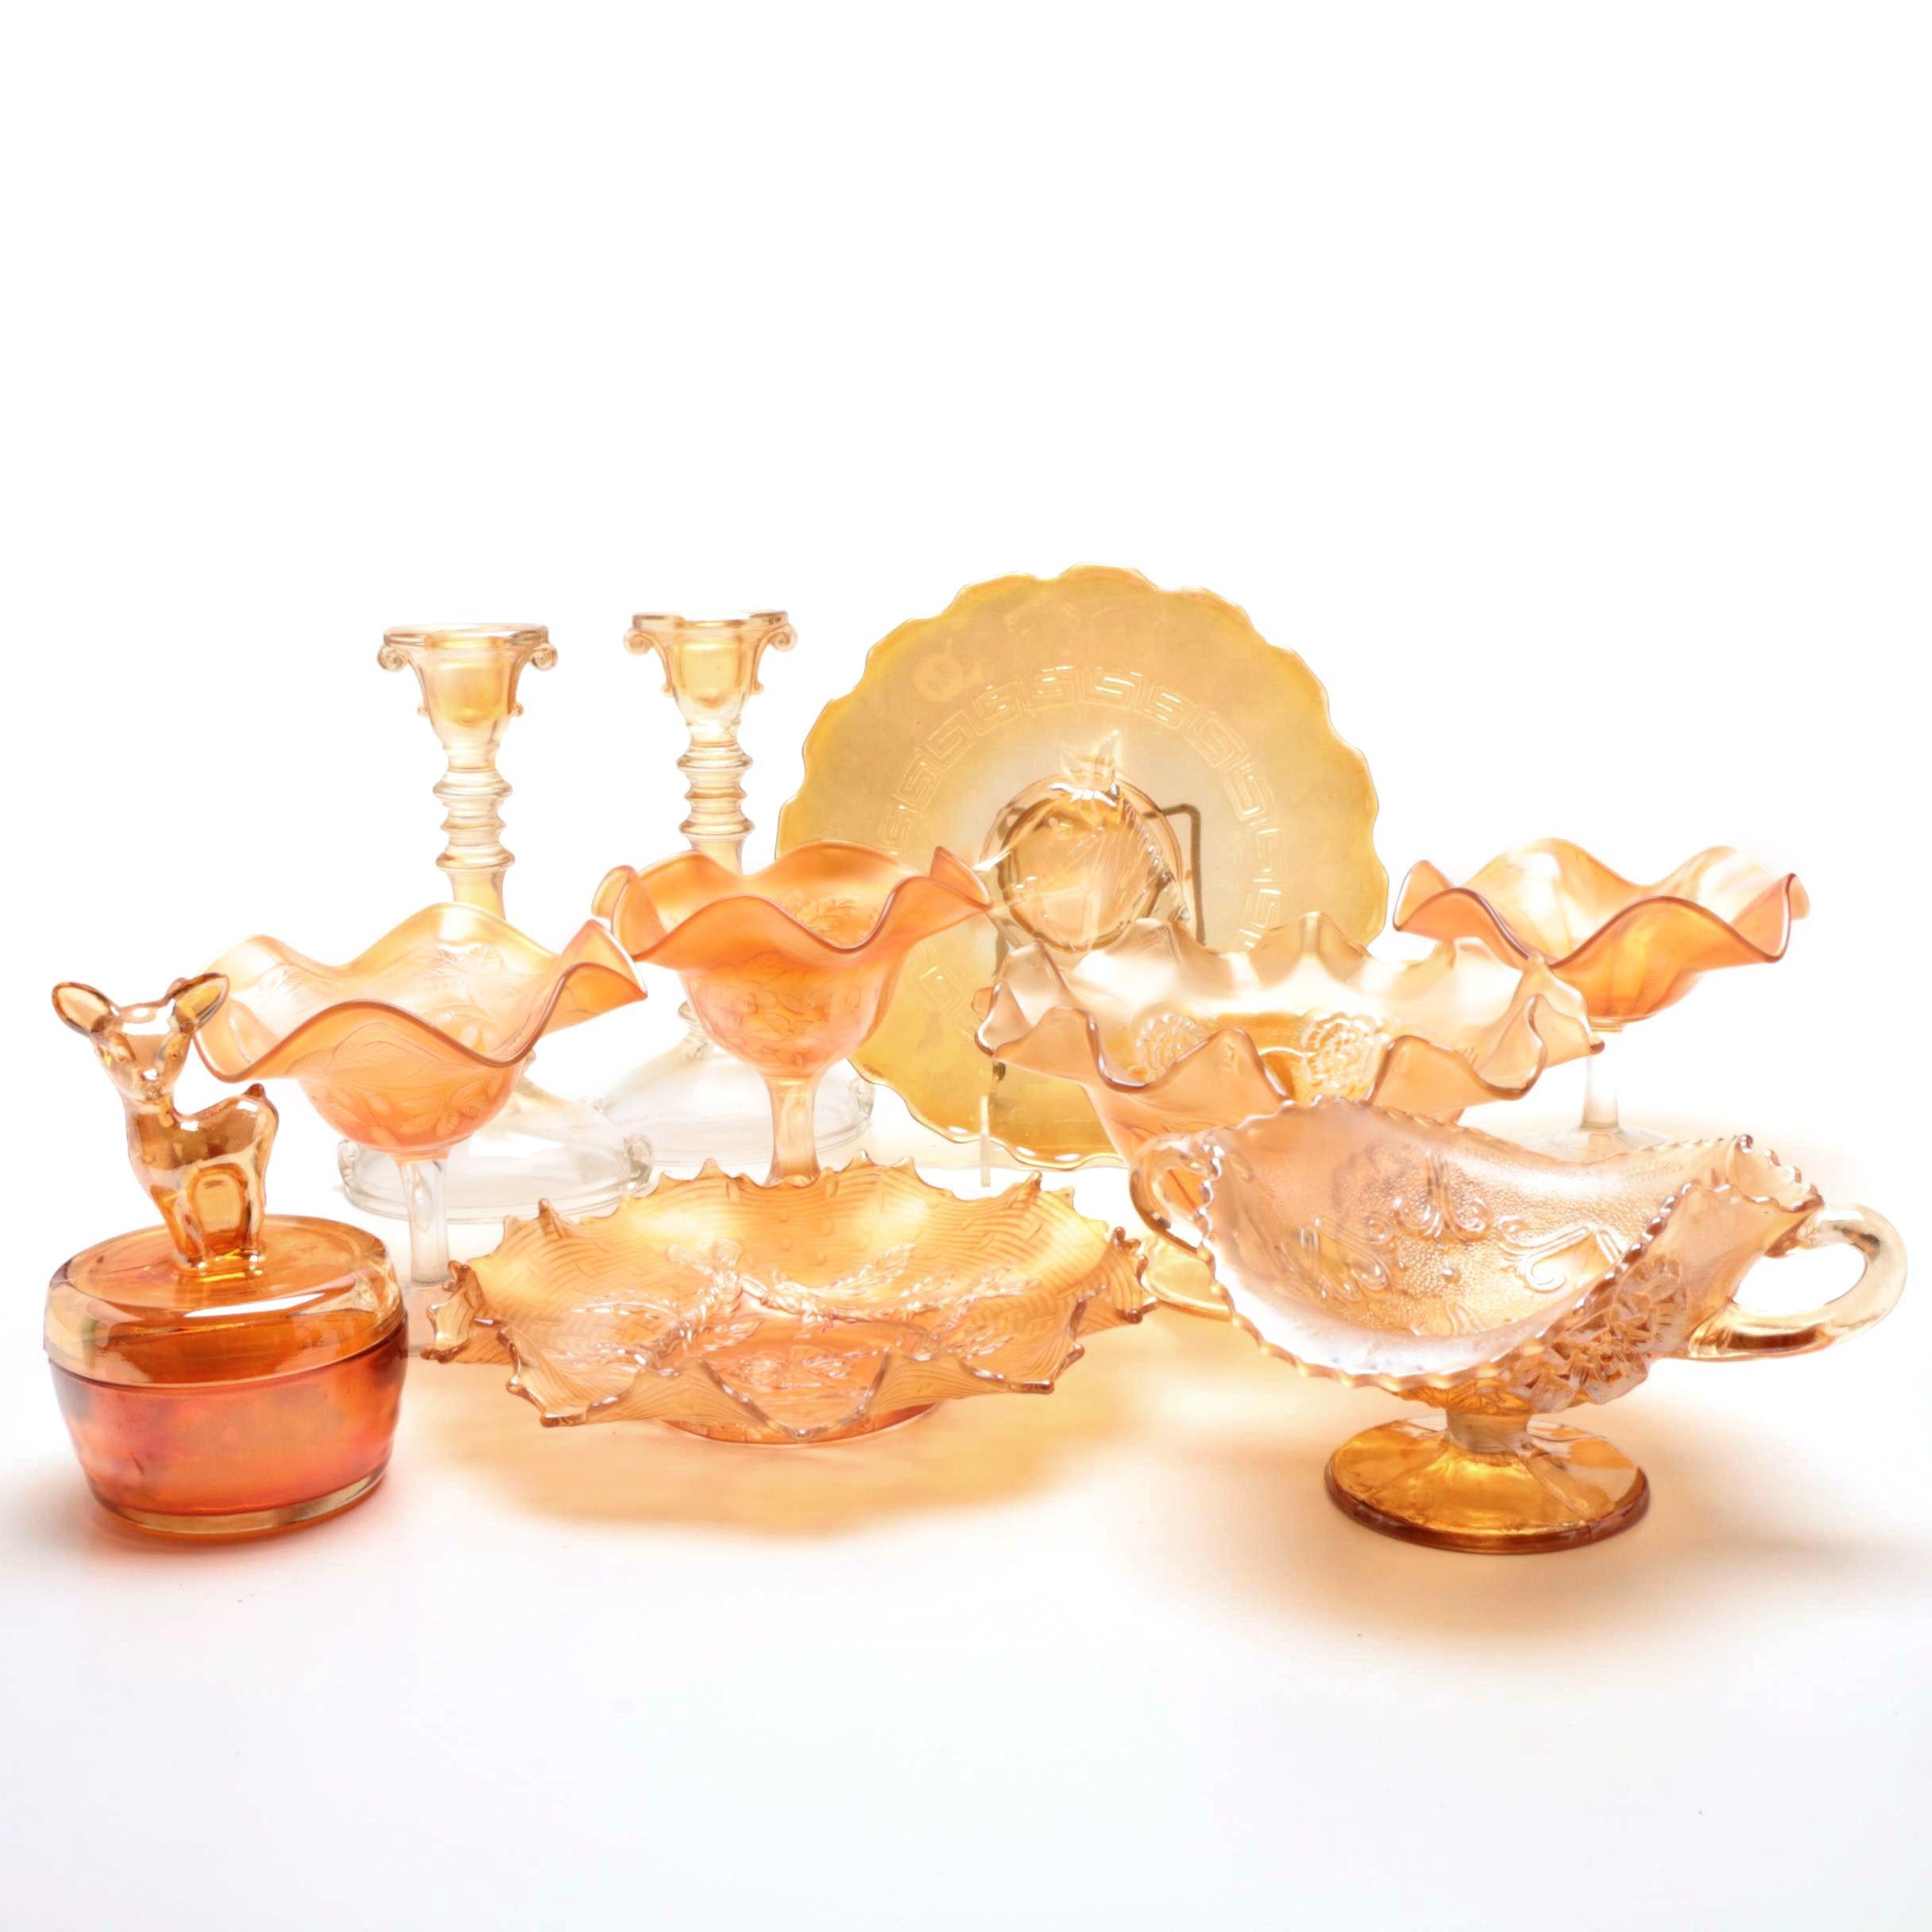 Carnival Glass Serveware and Table Decor